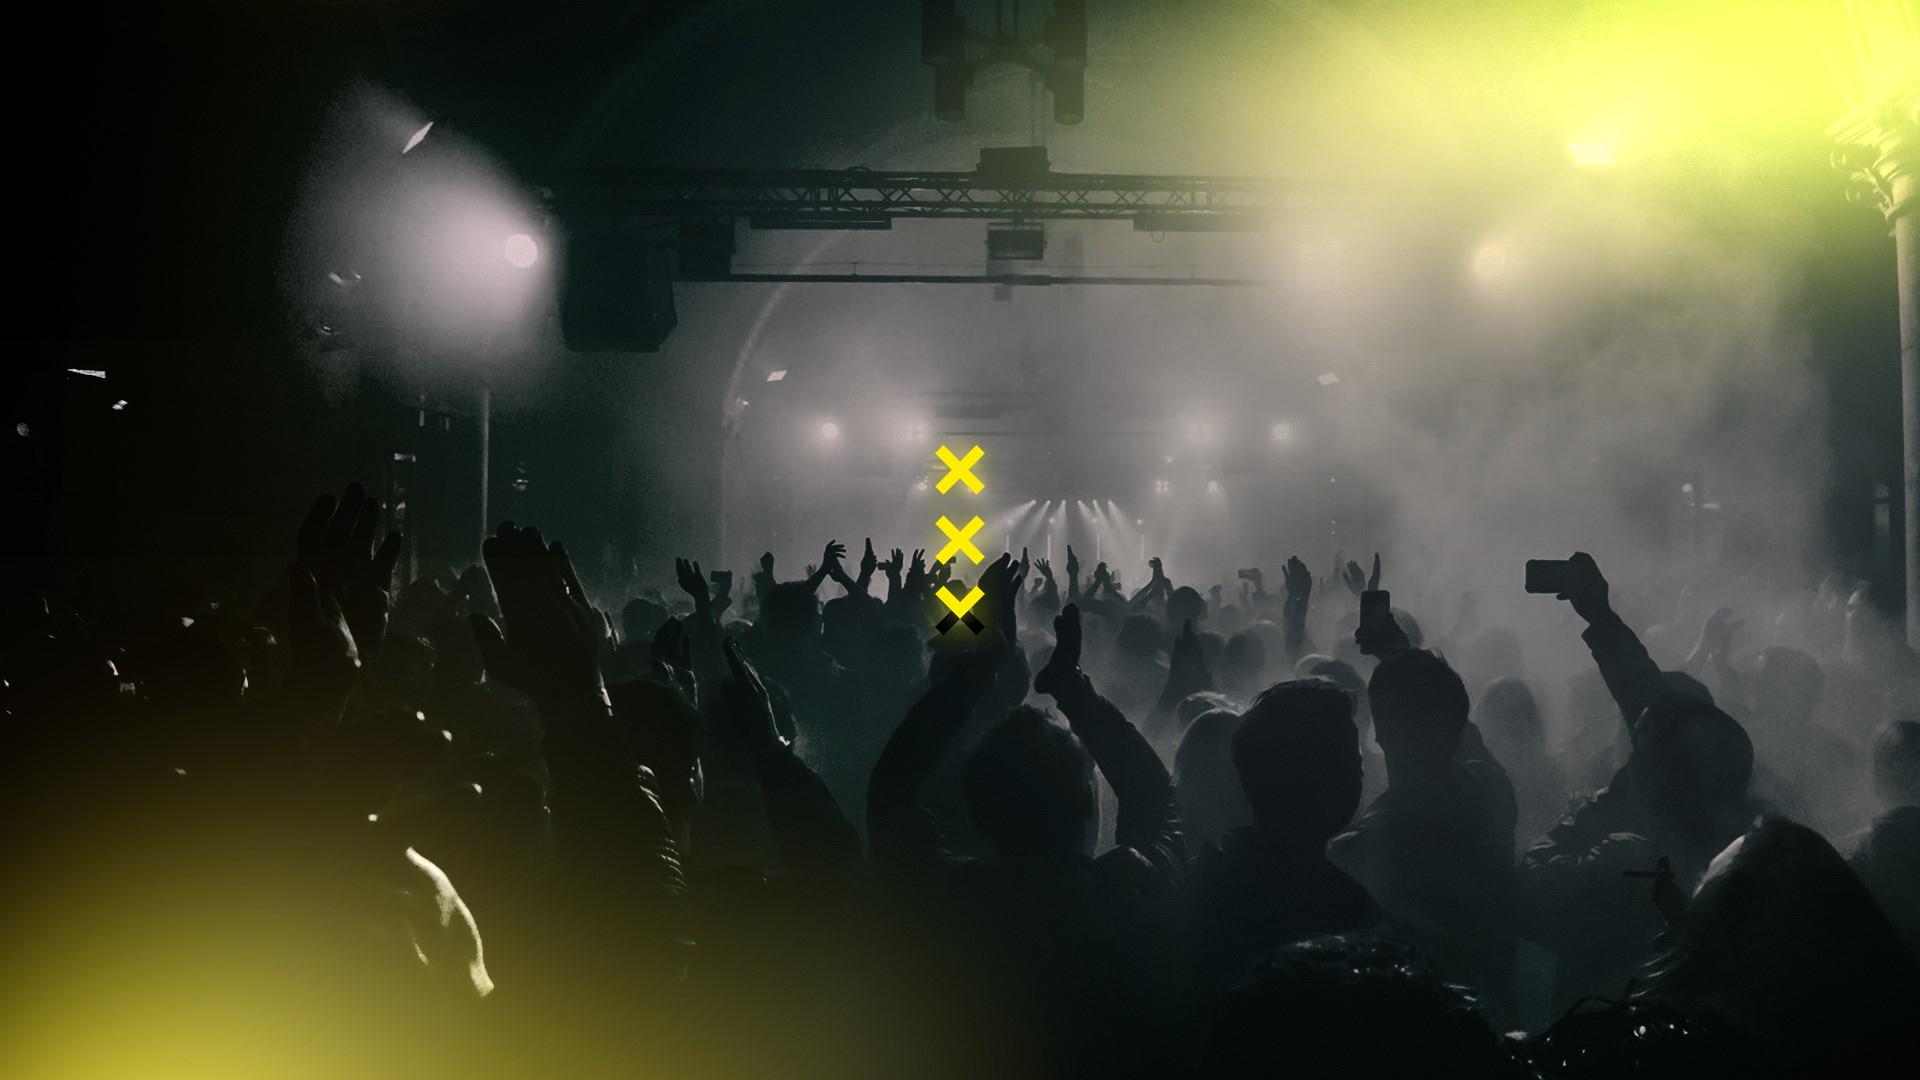 BonnarooやAustin City Limits、PARKLIFEなど|2021年開催予定の海外音楽フェス6選